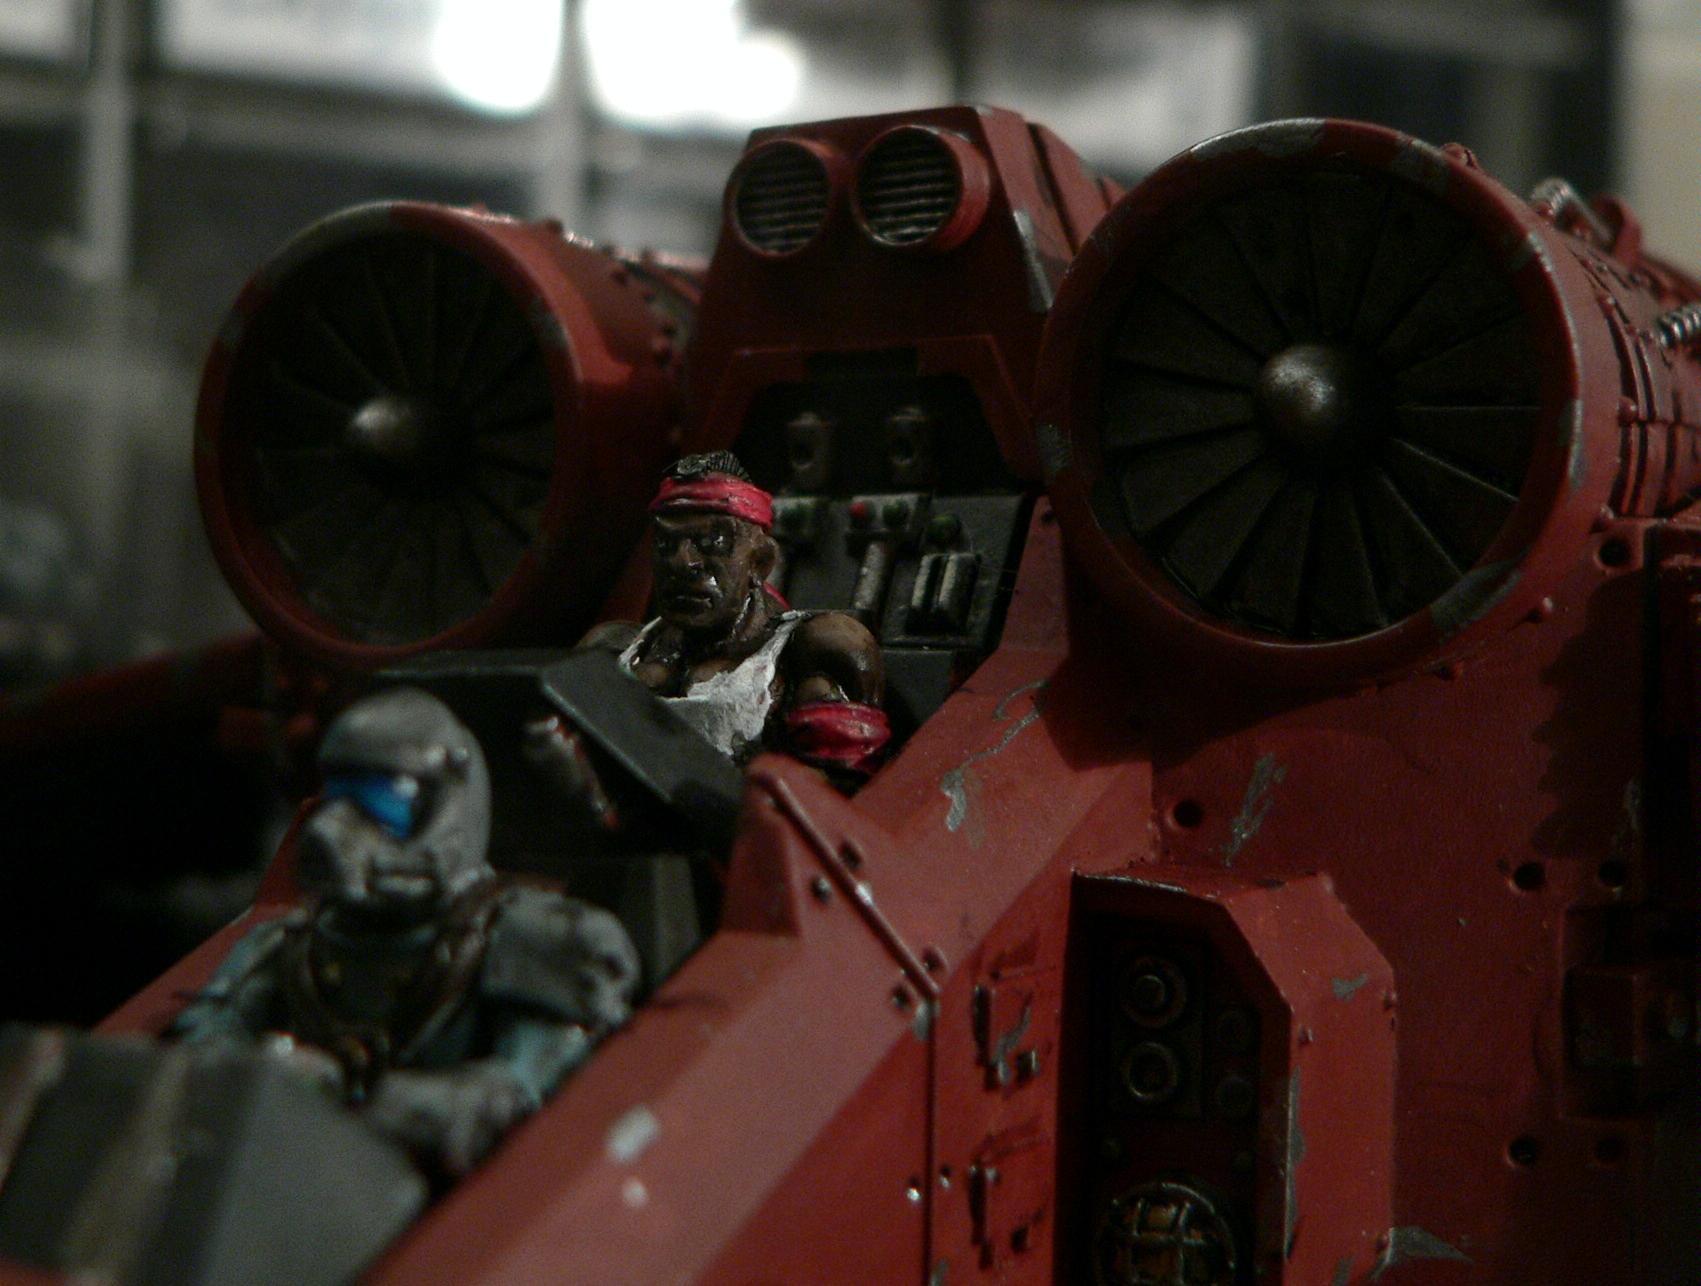 Catachan, Cockpit, Imperial Guard, Mars, Pilots, Valkyrie, Vendetta, Warhammer 40,000